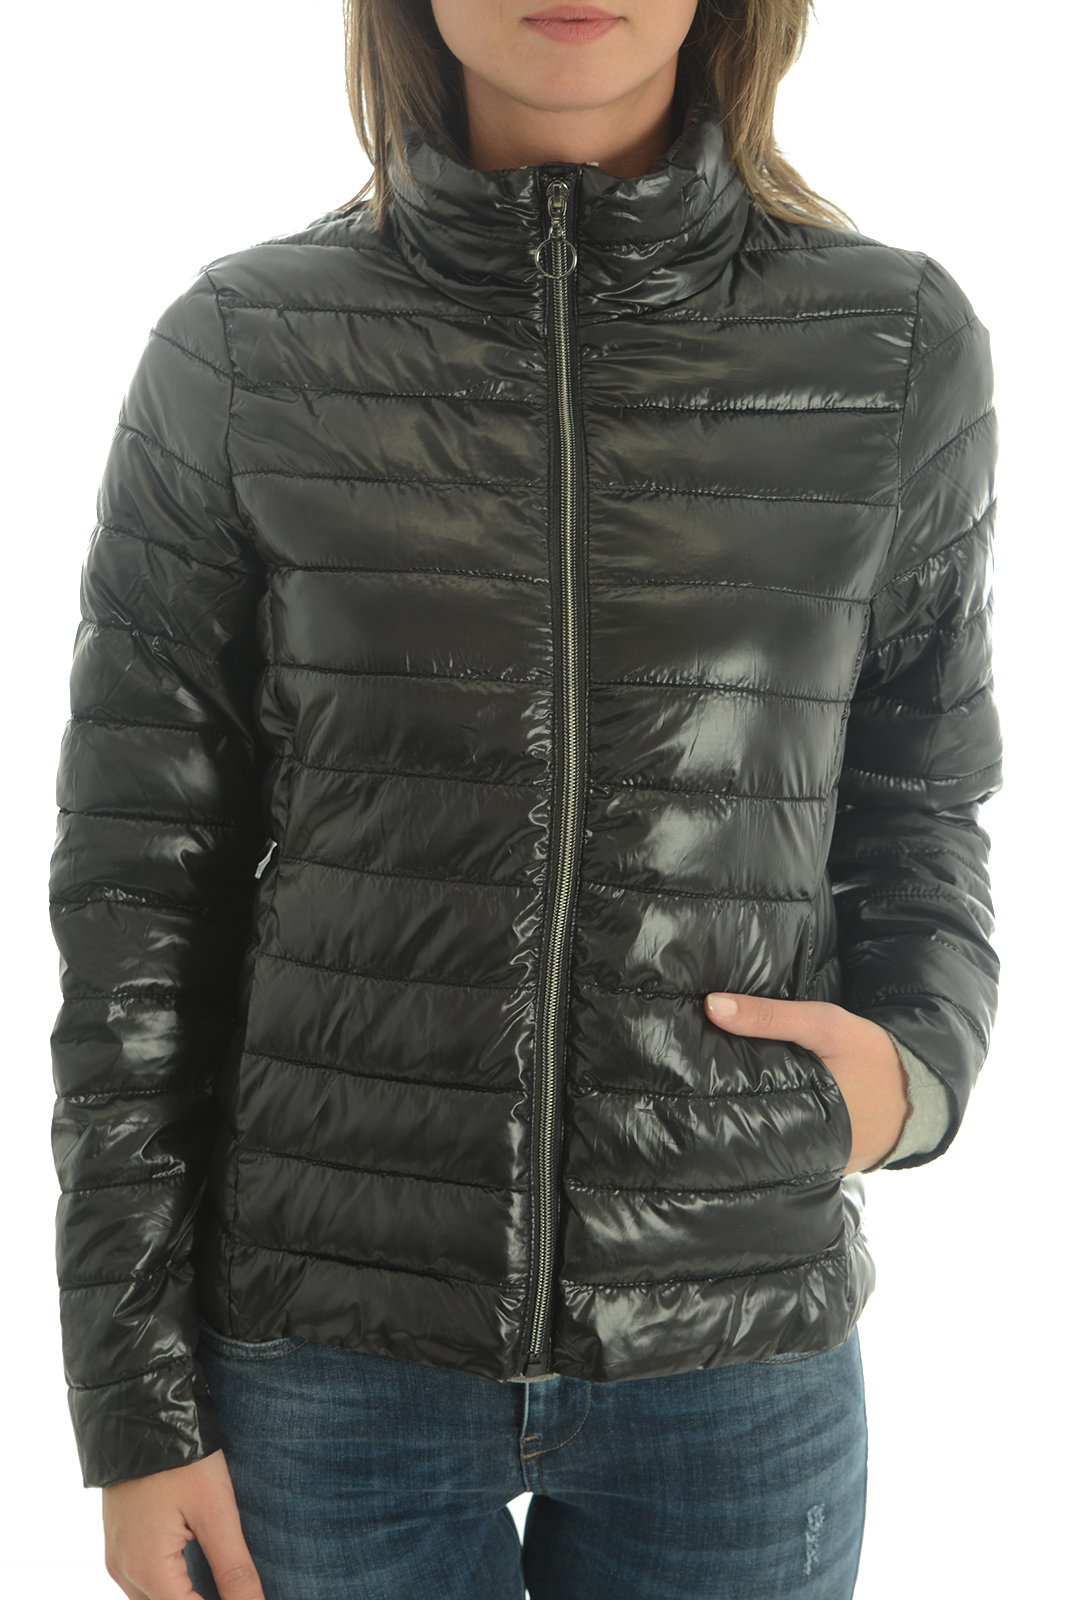 Vestes & blousons  Vero moda DOUBLE 3/4 JACKET BLACK/BLACK PADD